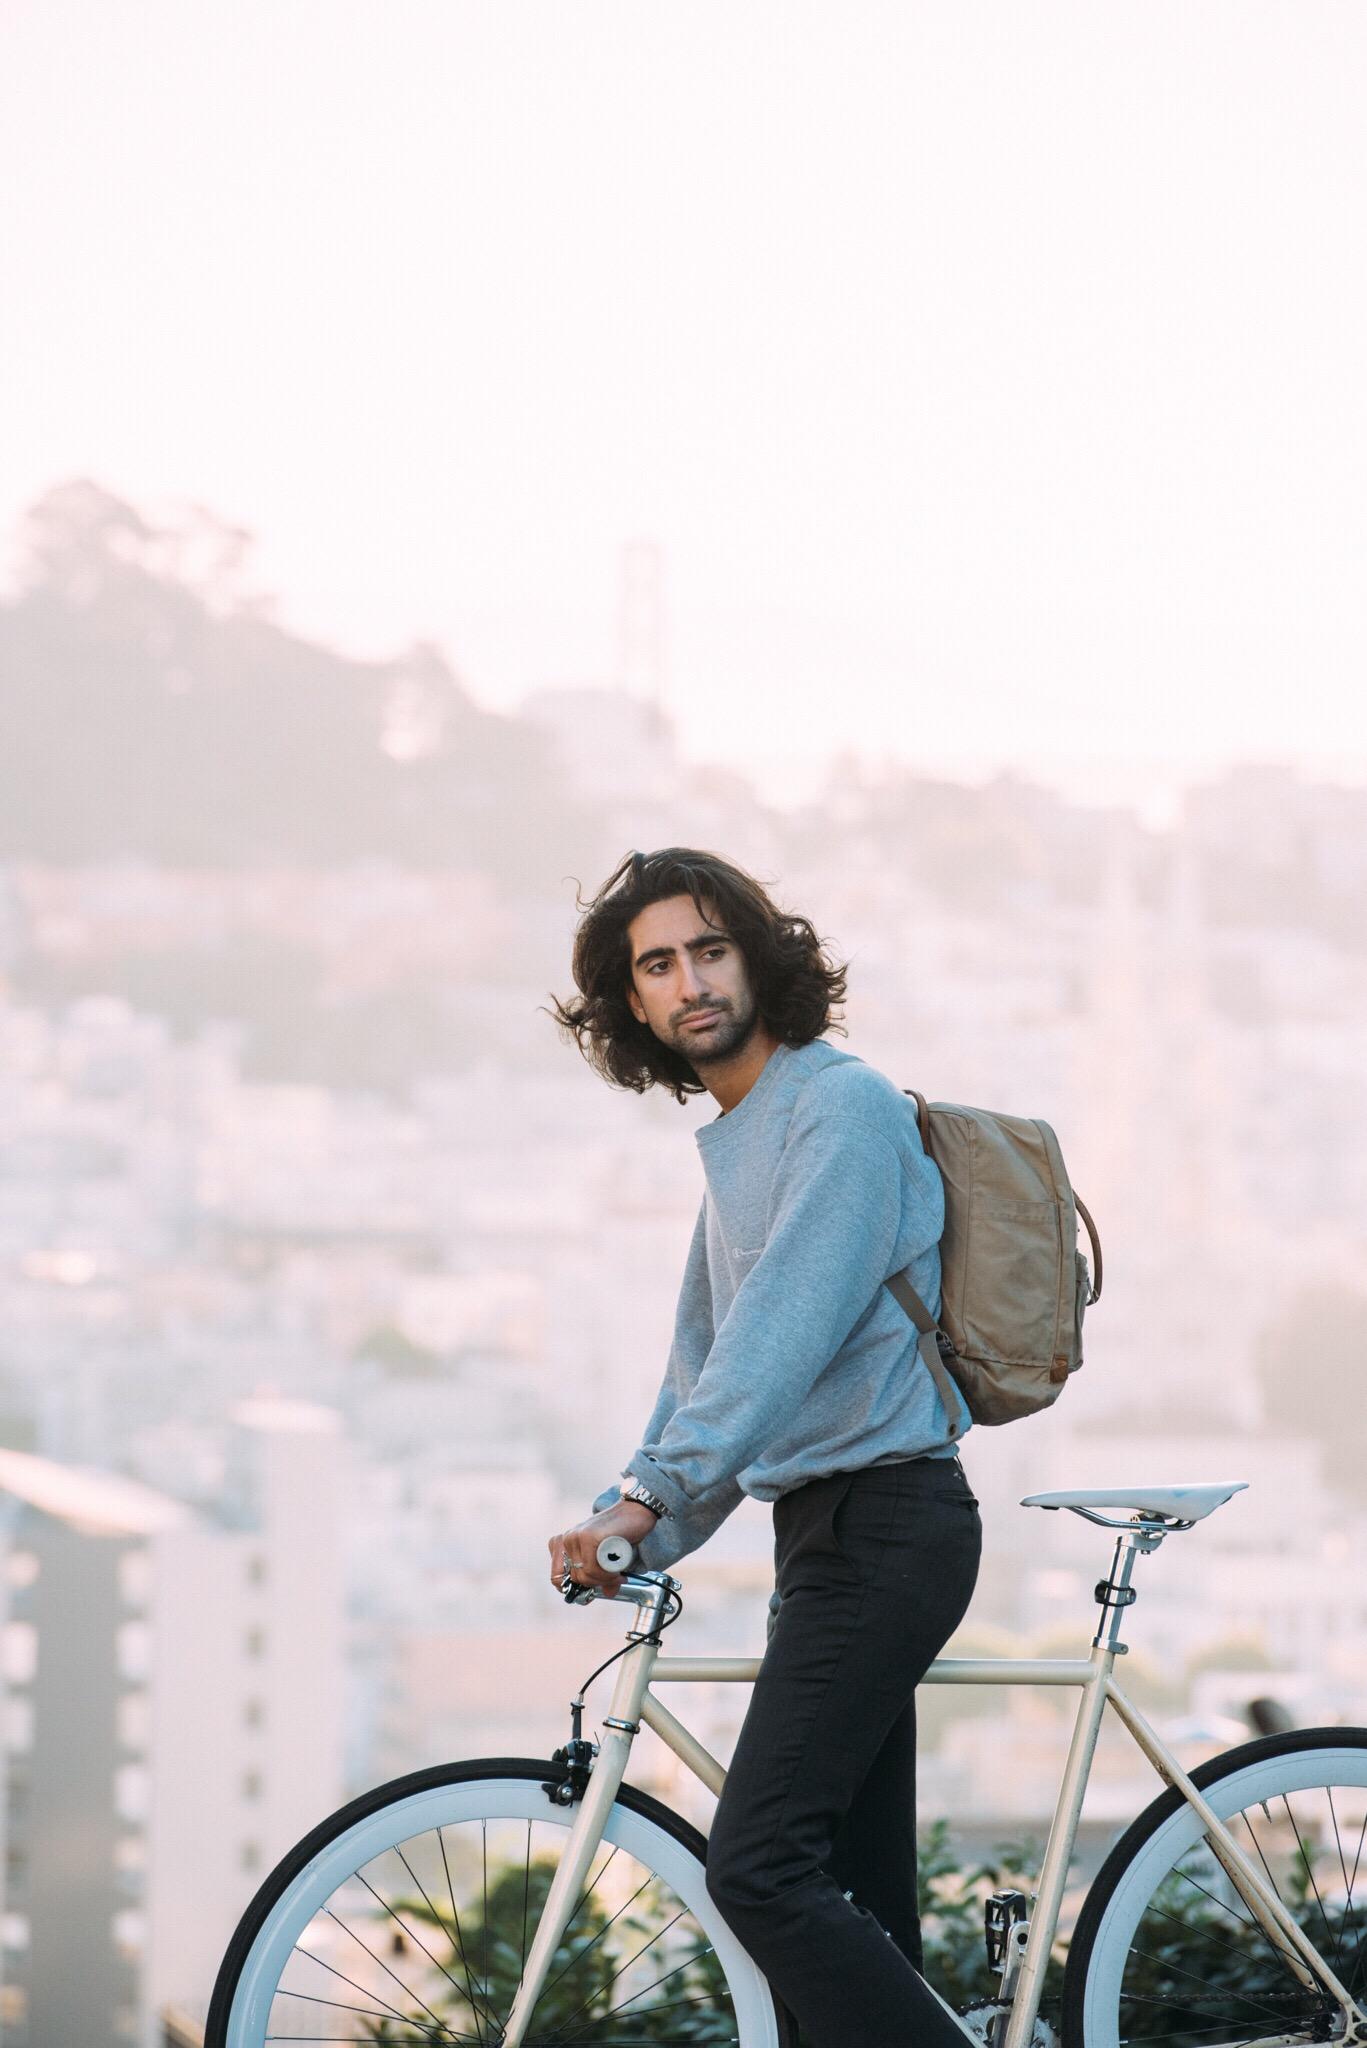 Me + bike +kånken